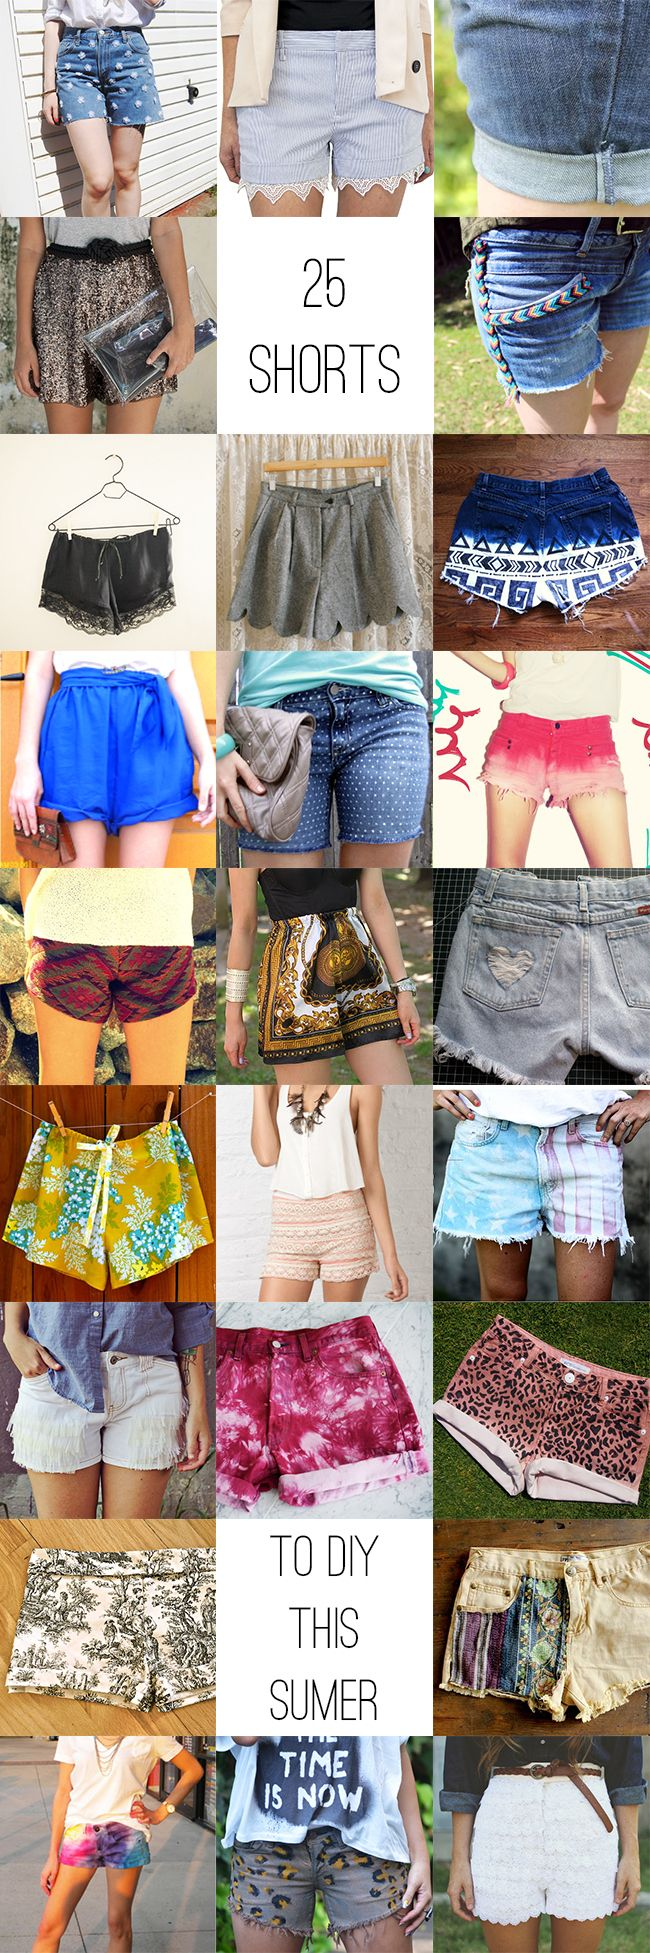 DIY shorts for summer